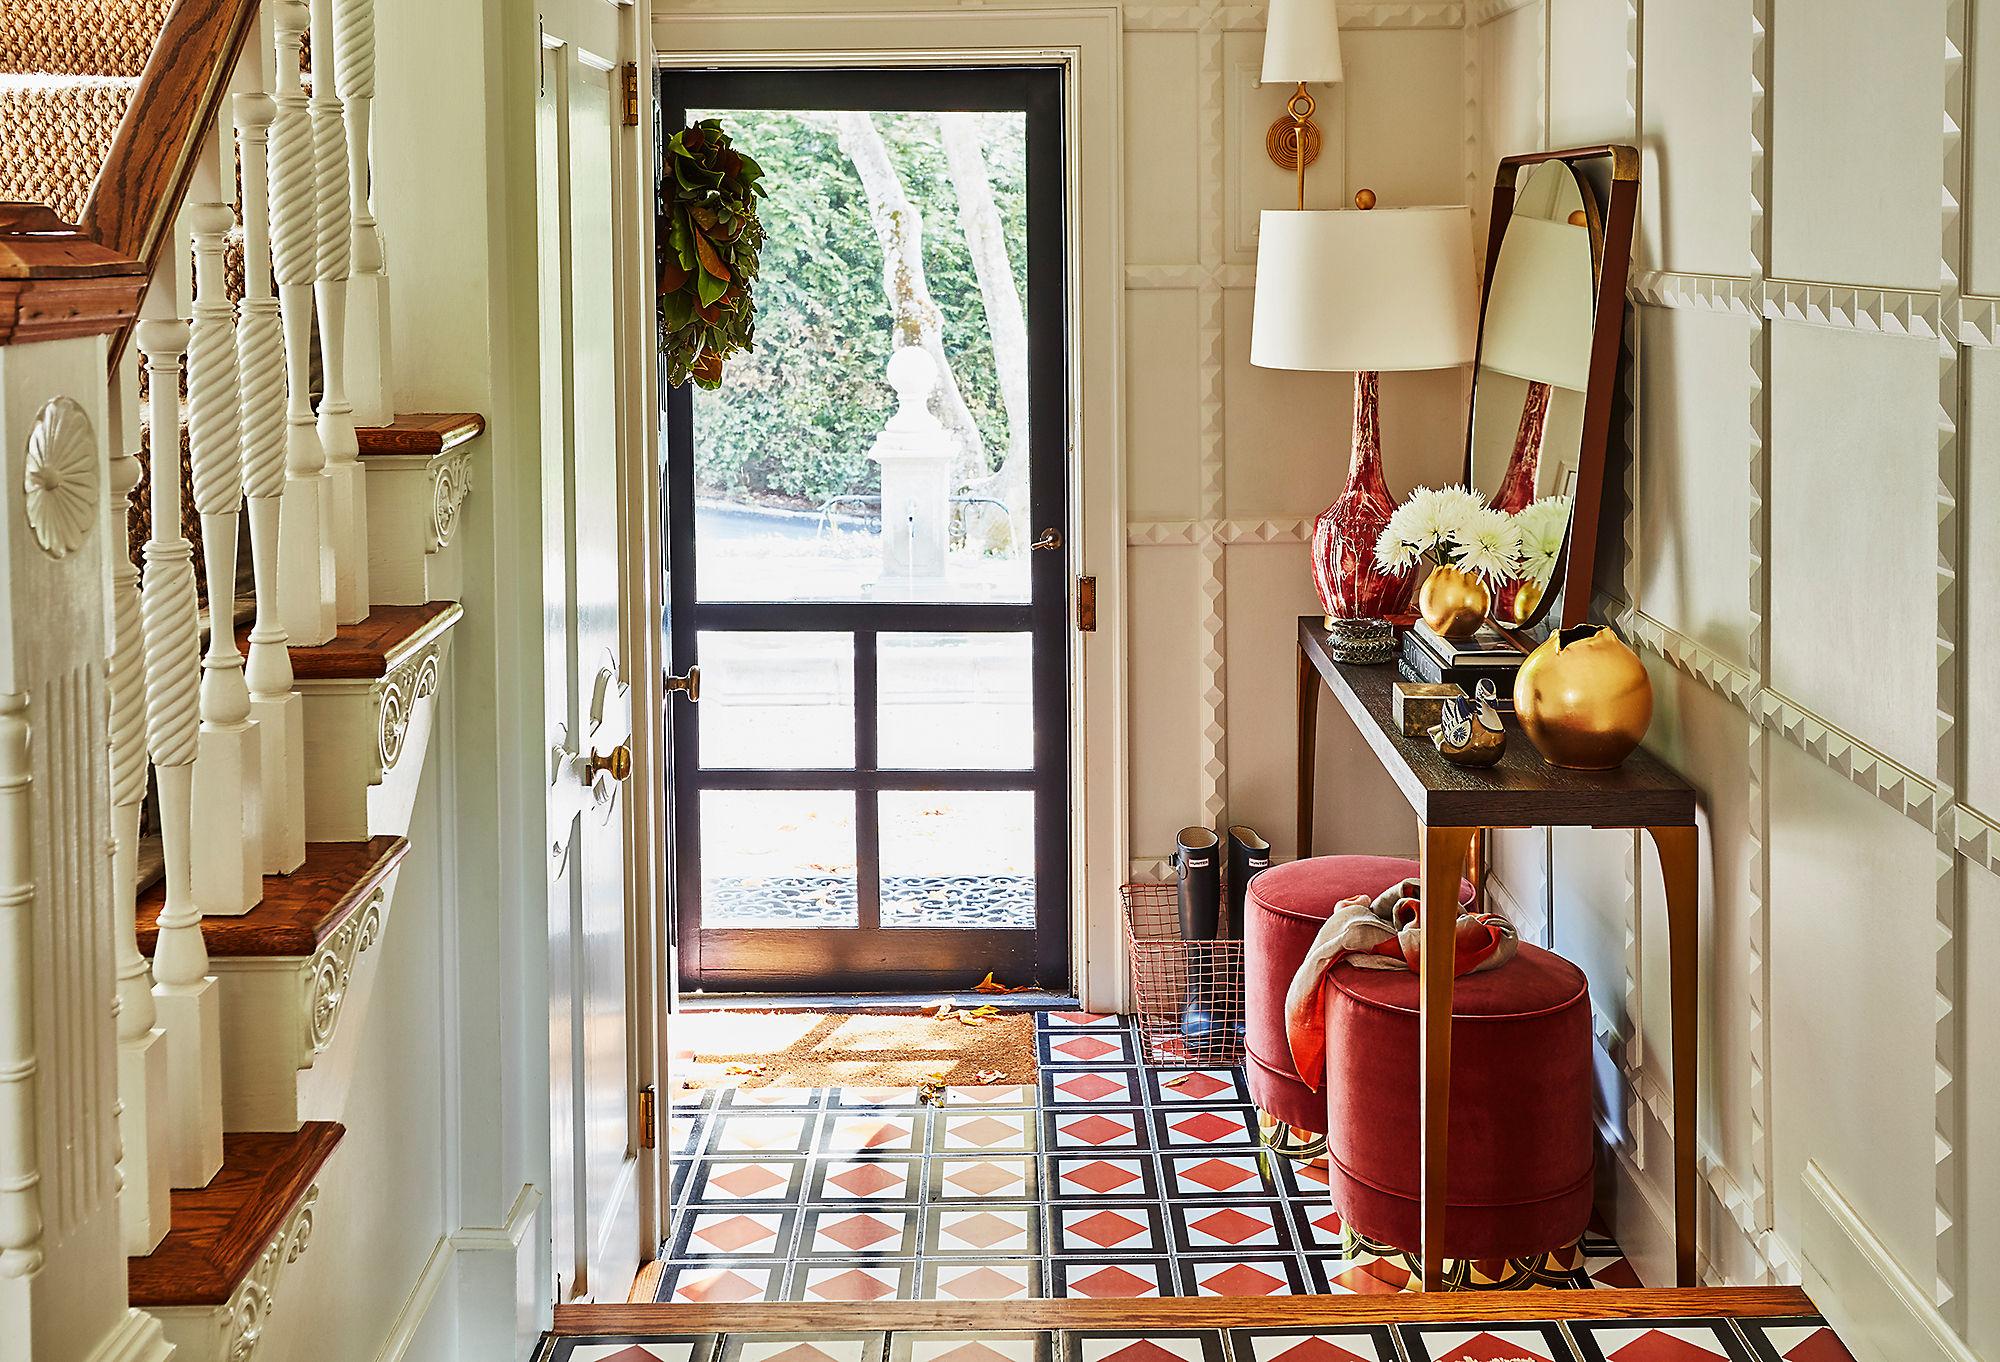 One Kings Lane | Home Decor & Luxury Furniture | Design